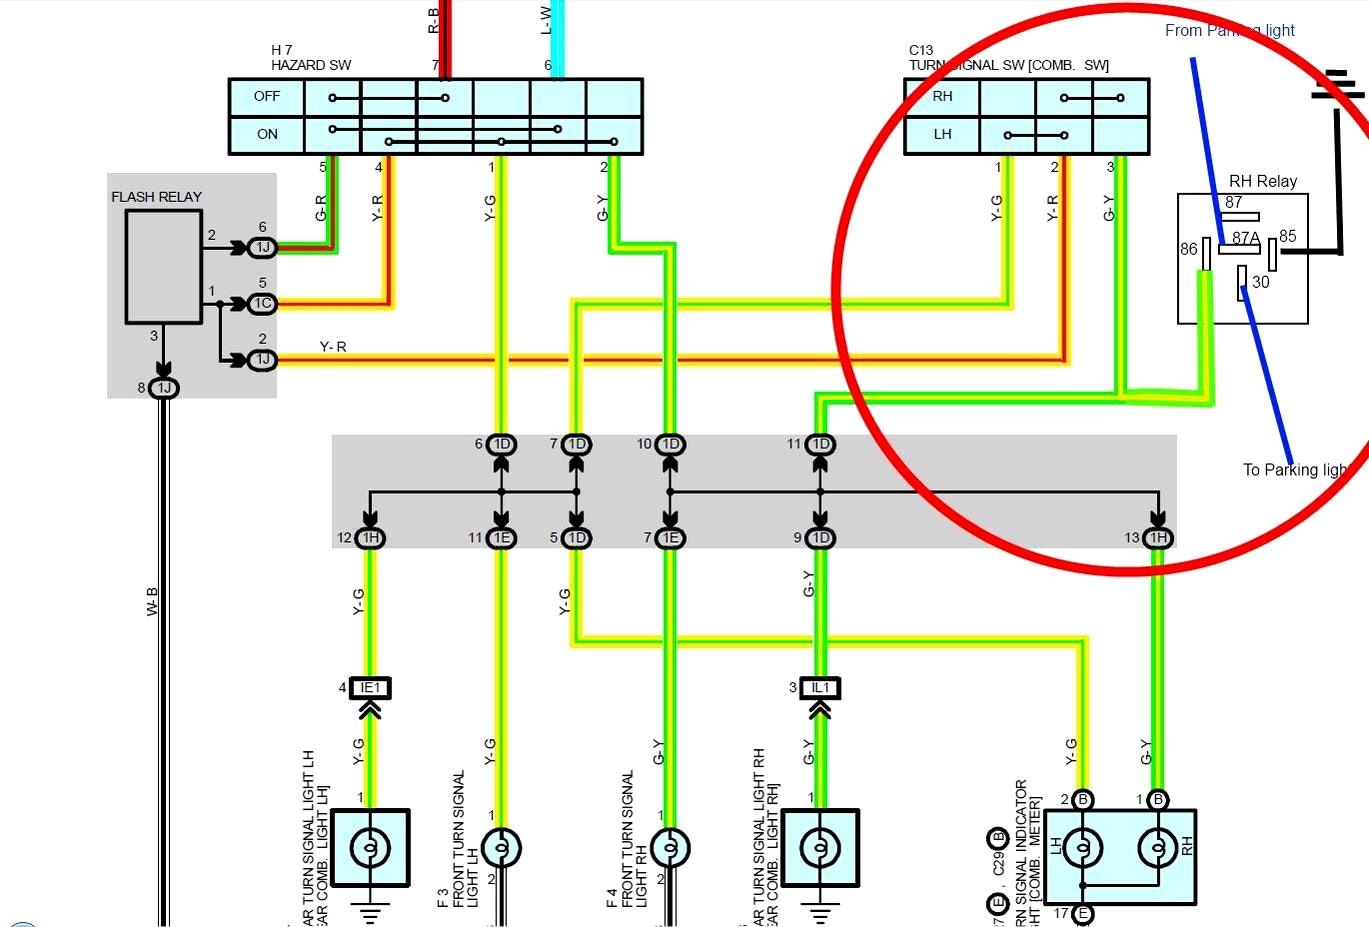 2002 toyota camry wiring diagram whelen lightbar 02 radio library